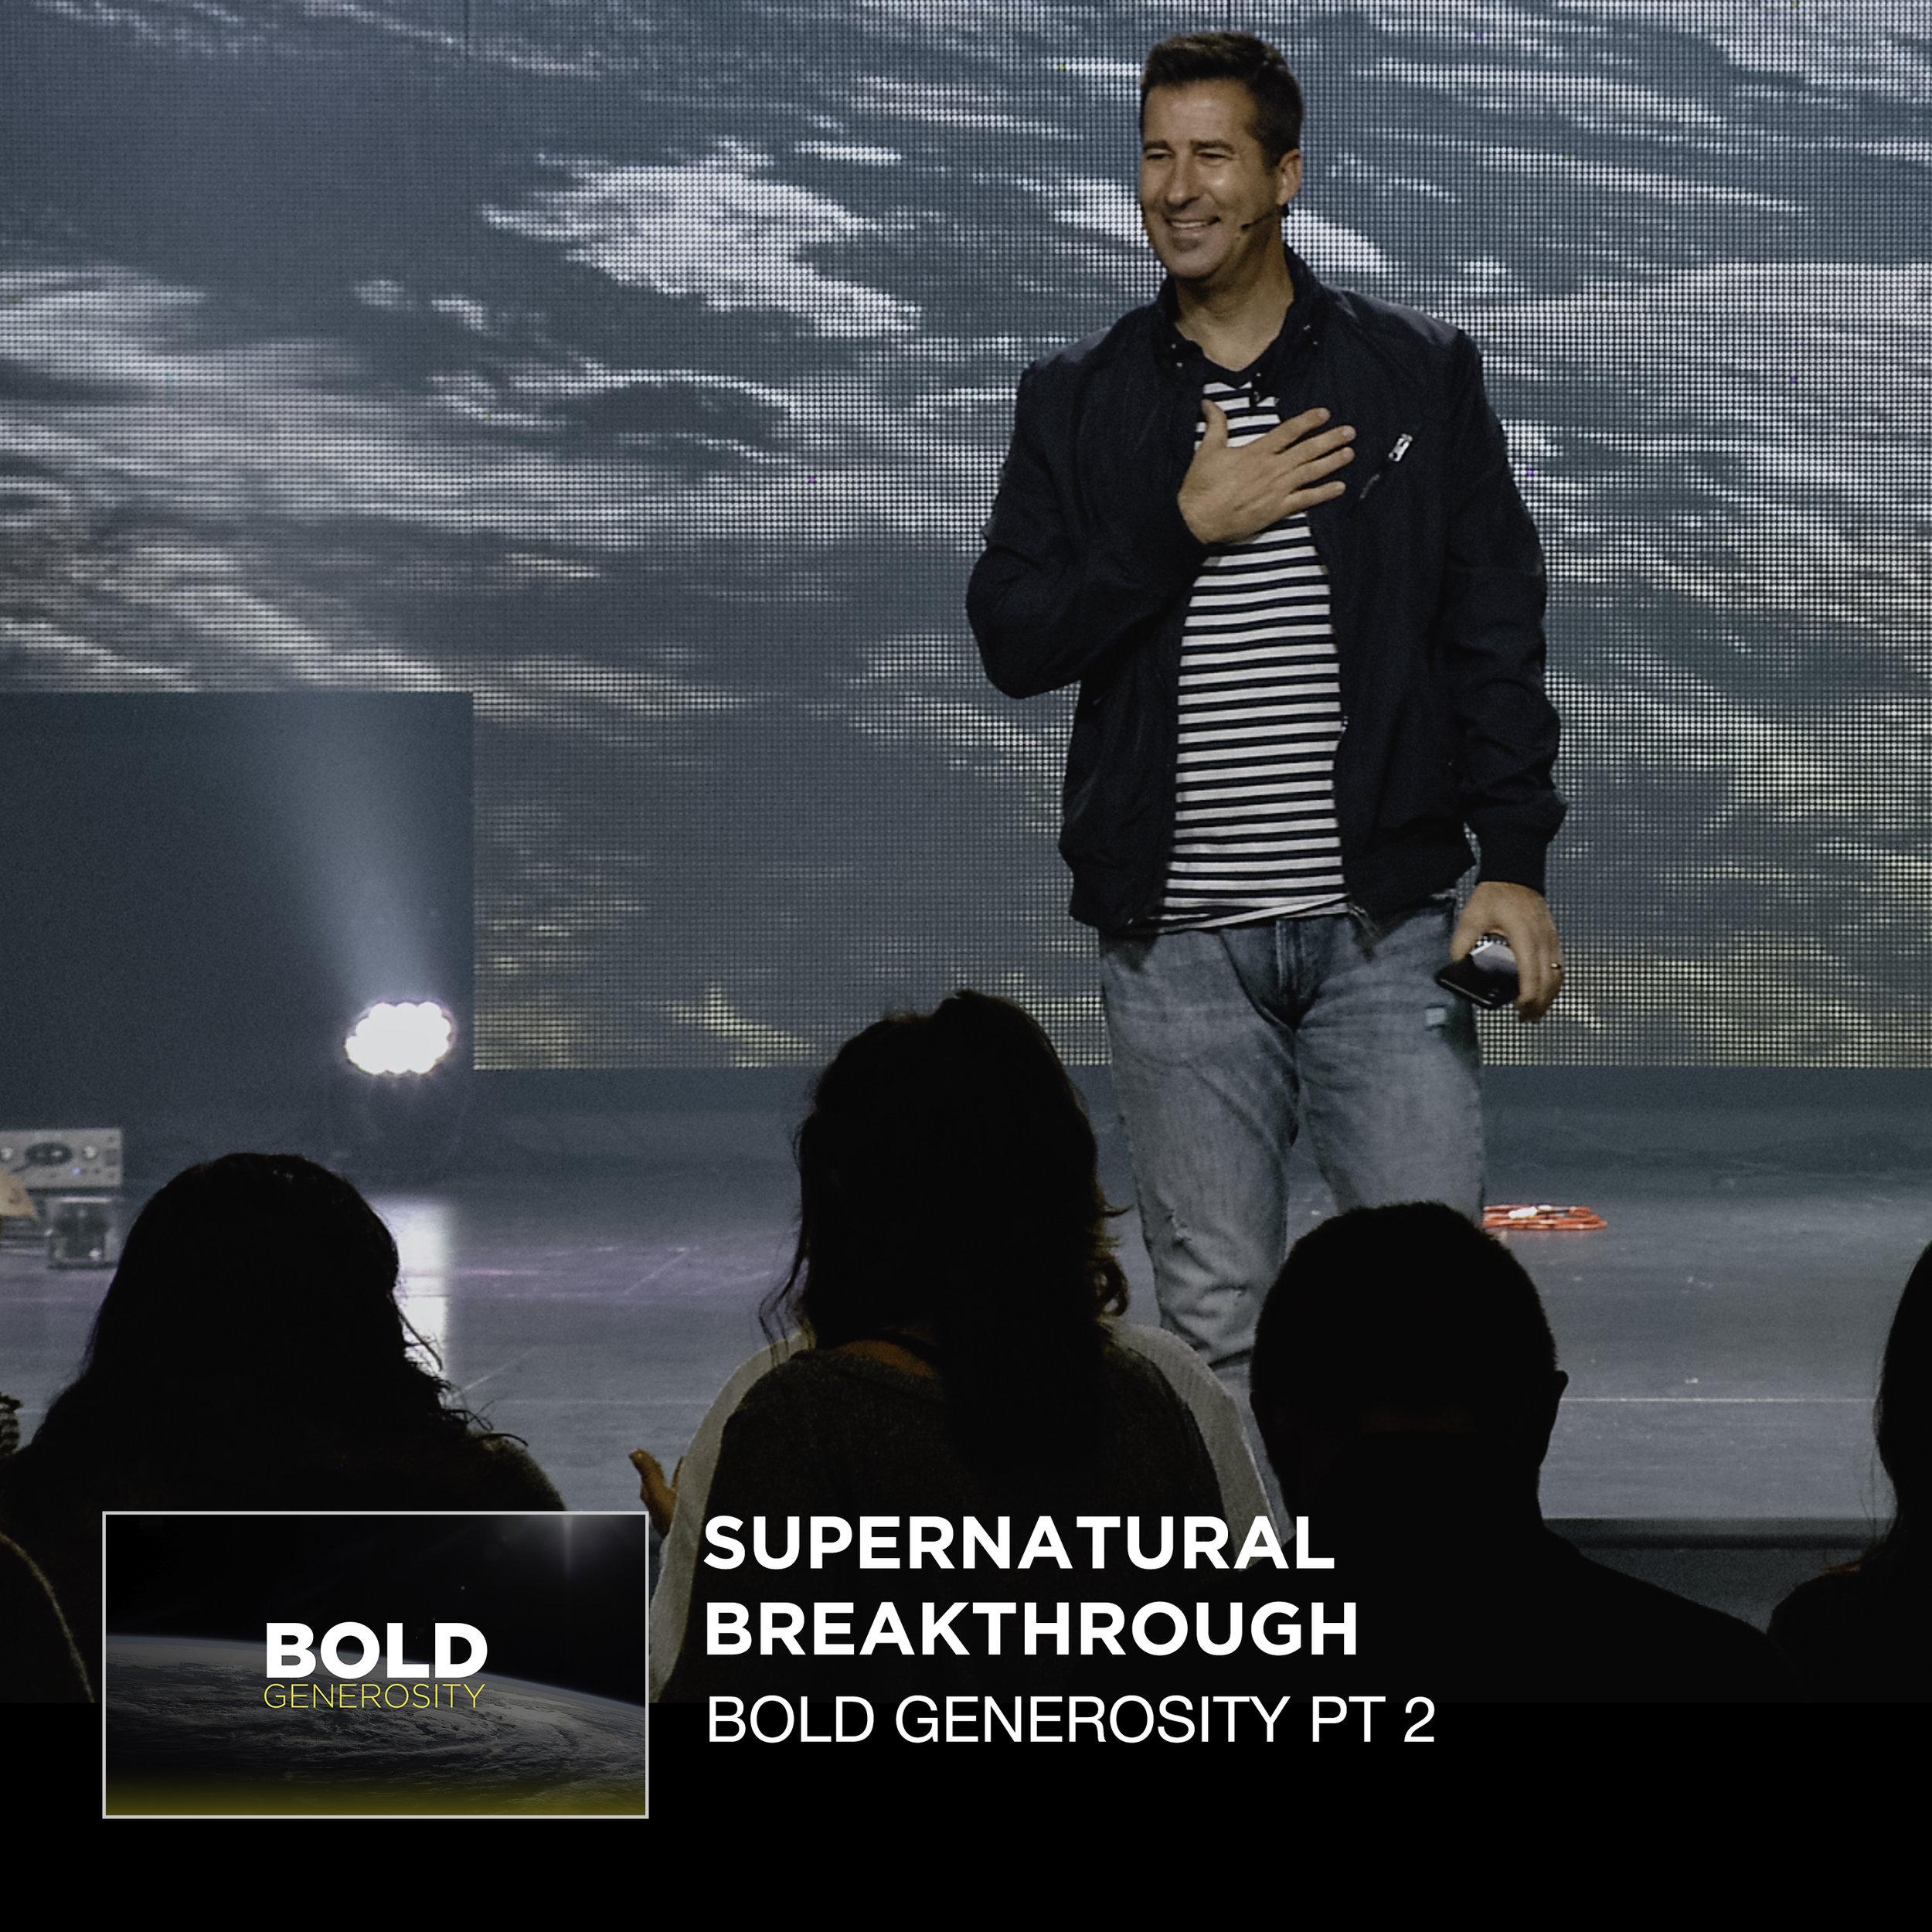 Bold Generosity Pt 2 _ Supernatural Breakthrough _ Jared Ming Web.jpg